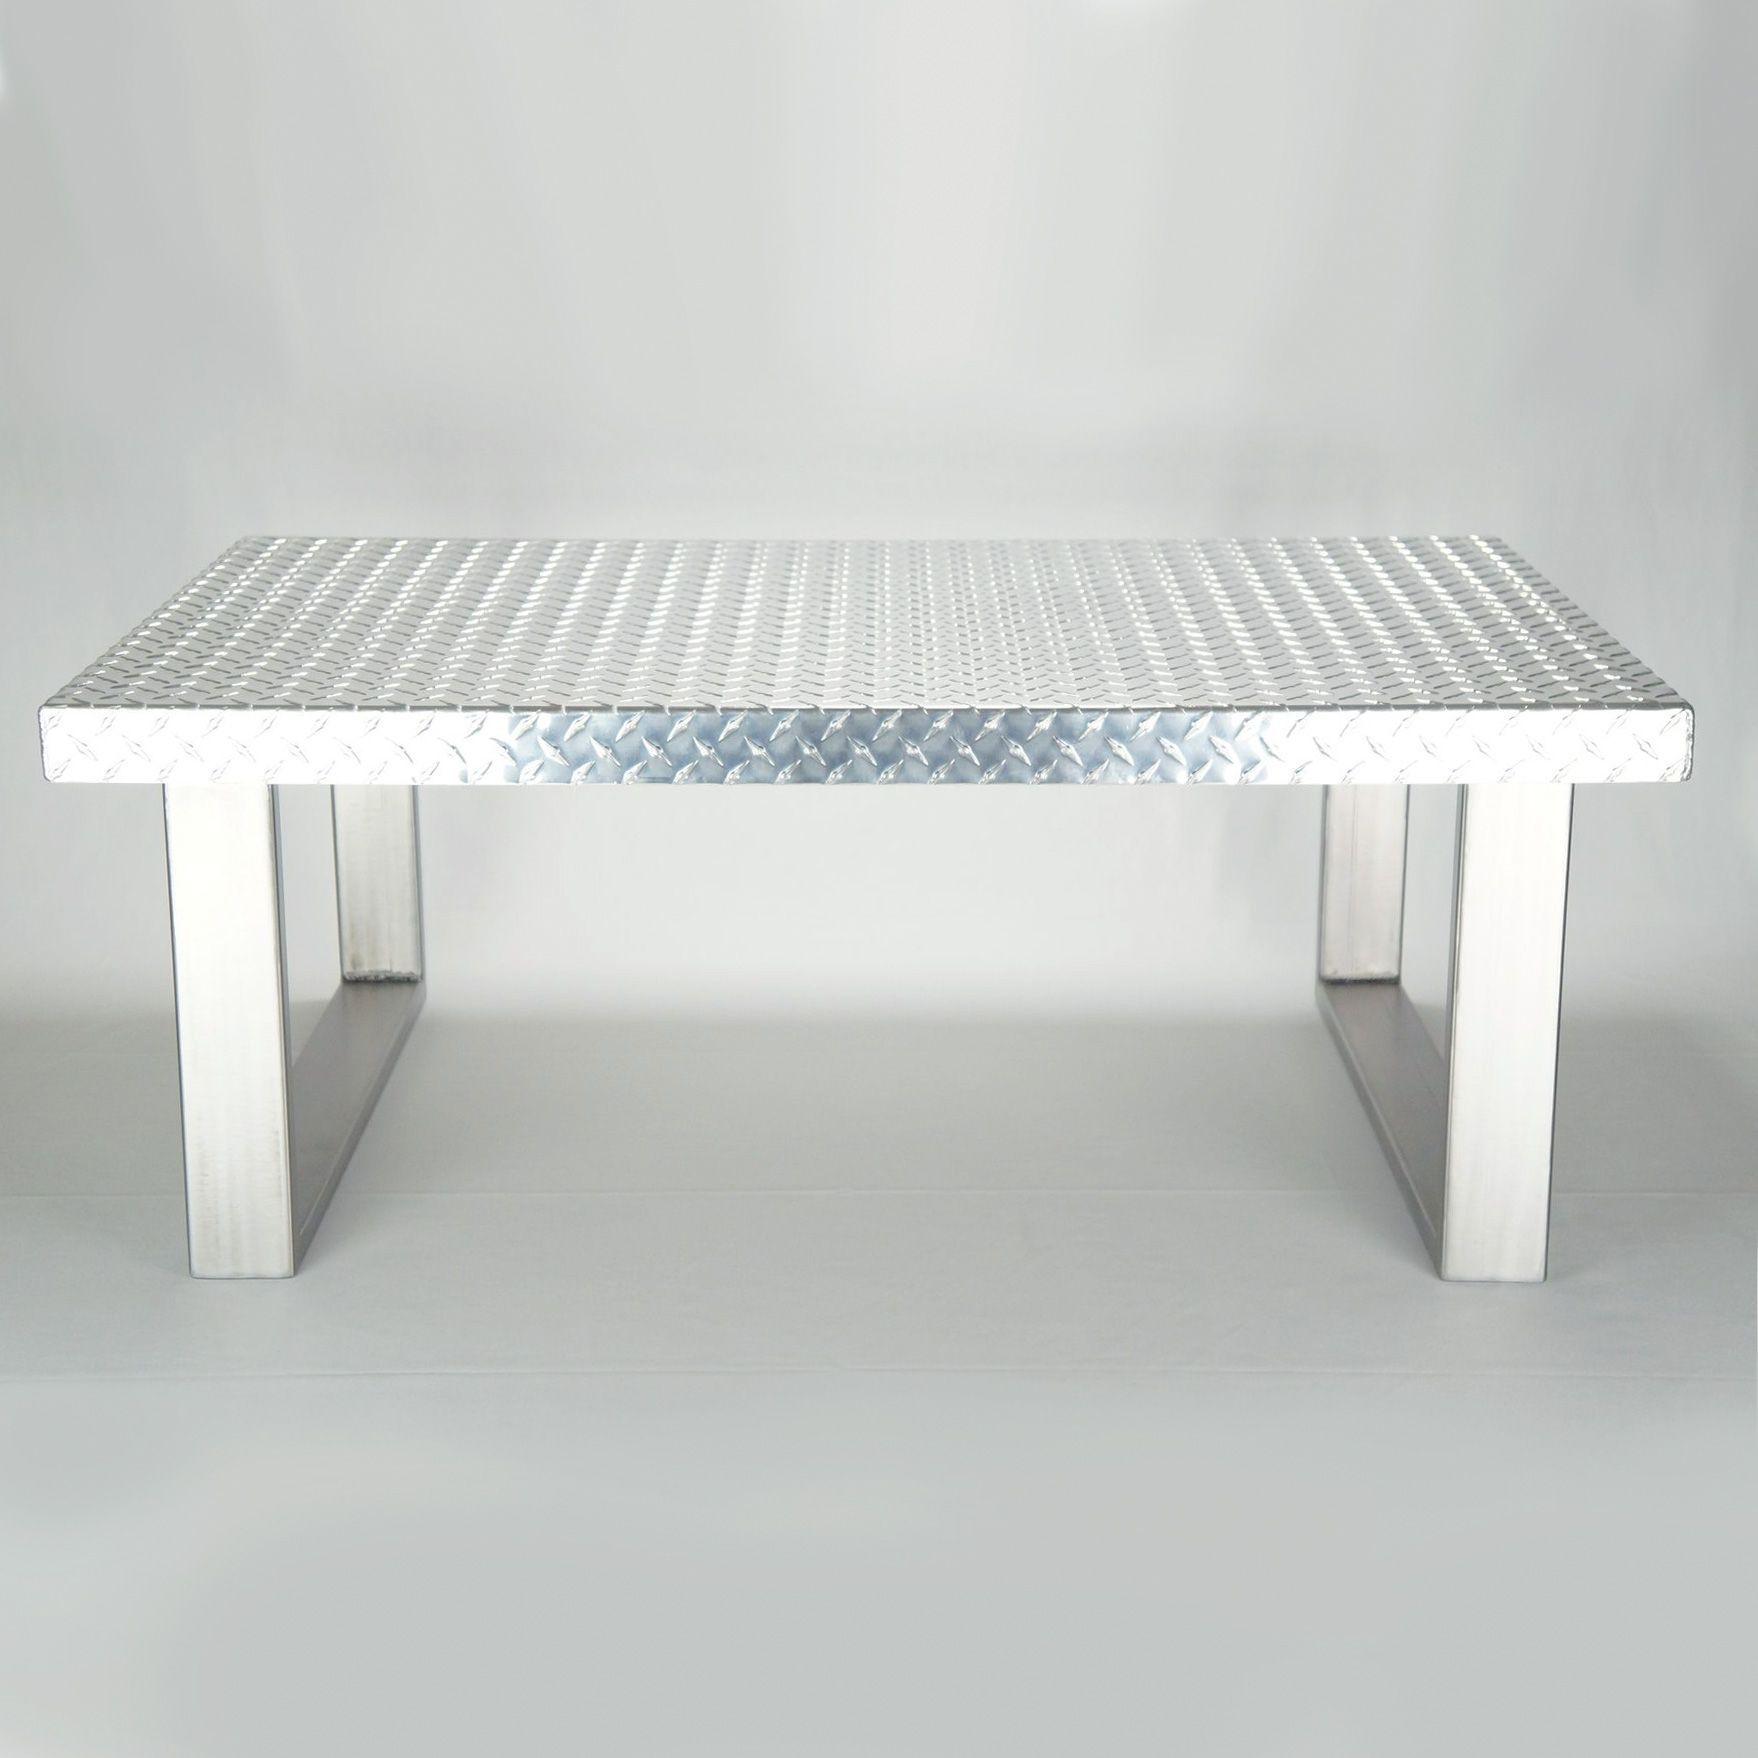 Custom Made Industrial Diamond Plate Metal Coffee Table